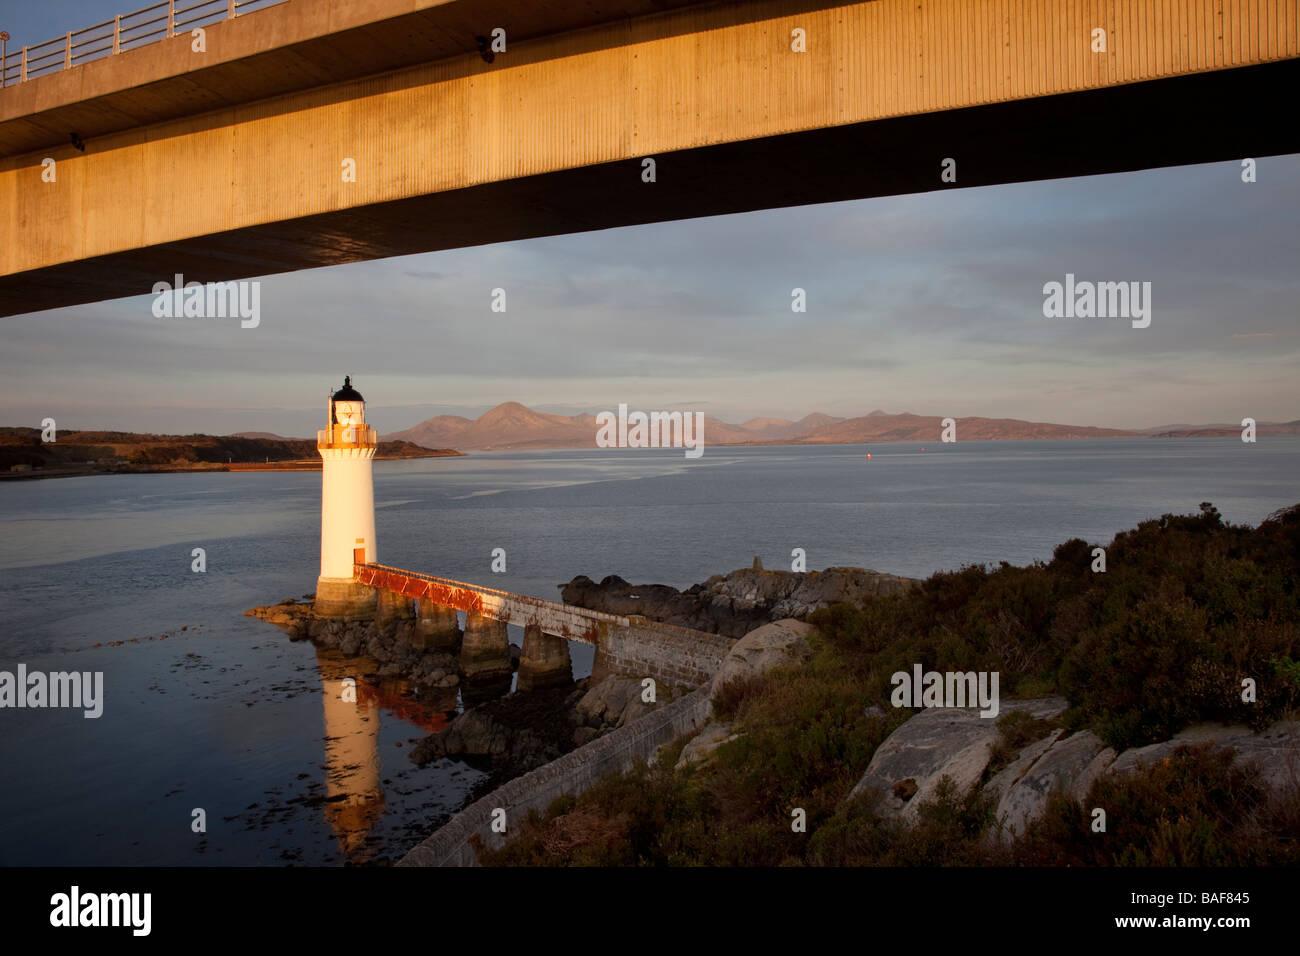 Skye Bridge, and lighthouse. or light house on the Isle of Skye, Scotland, UK - Stock Image